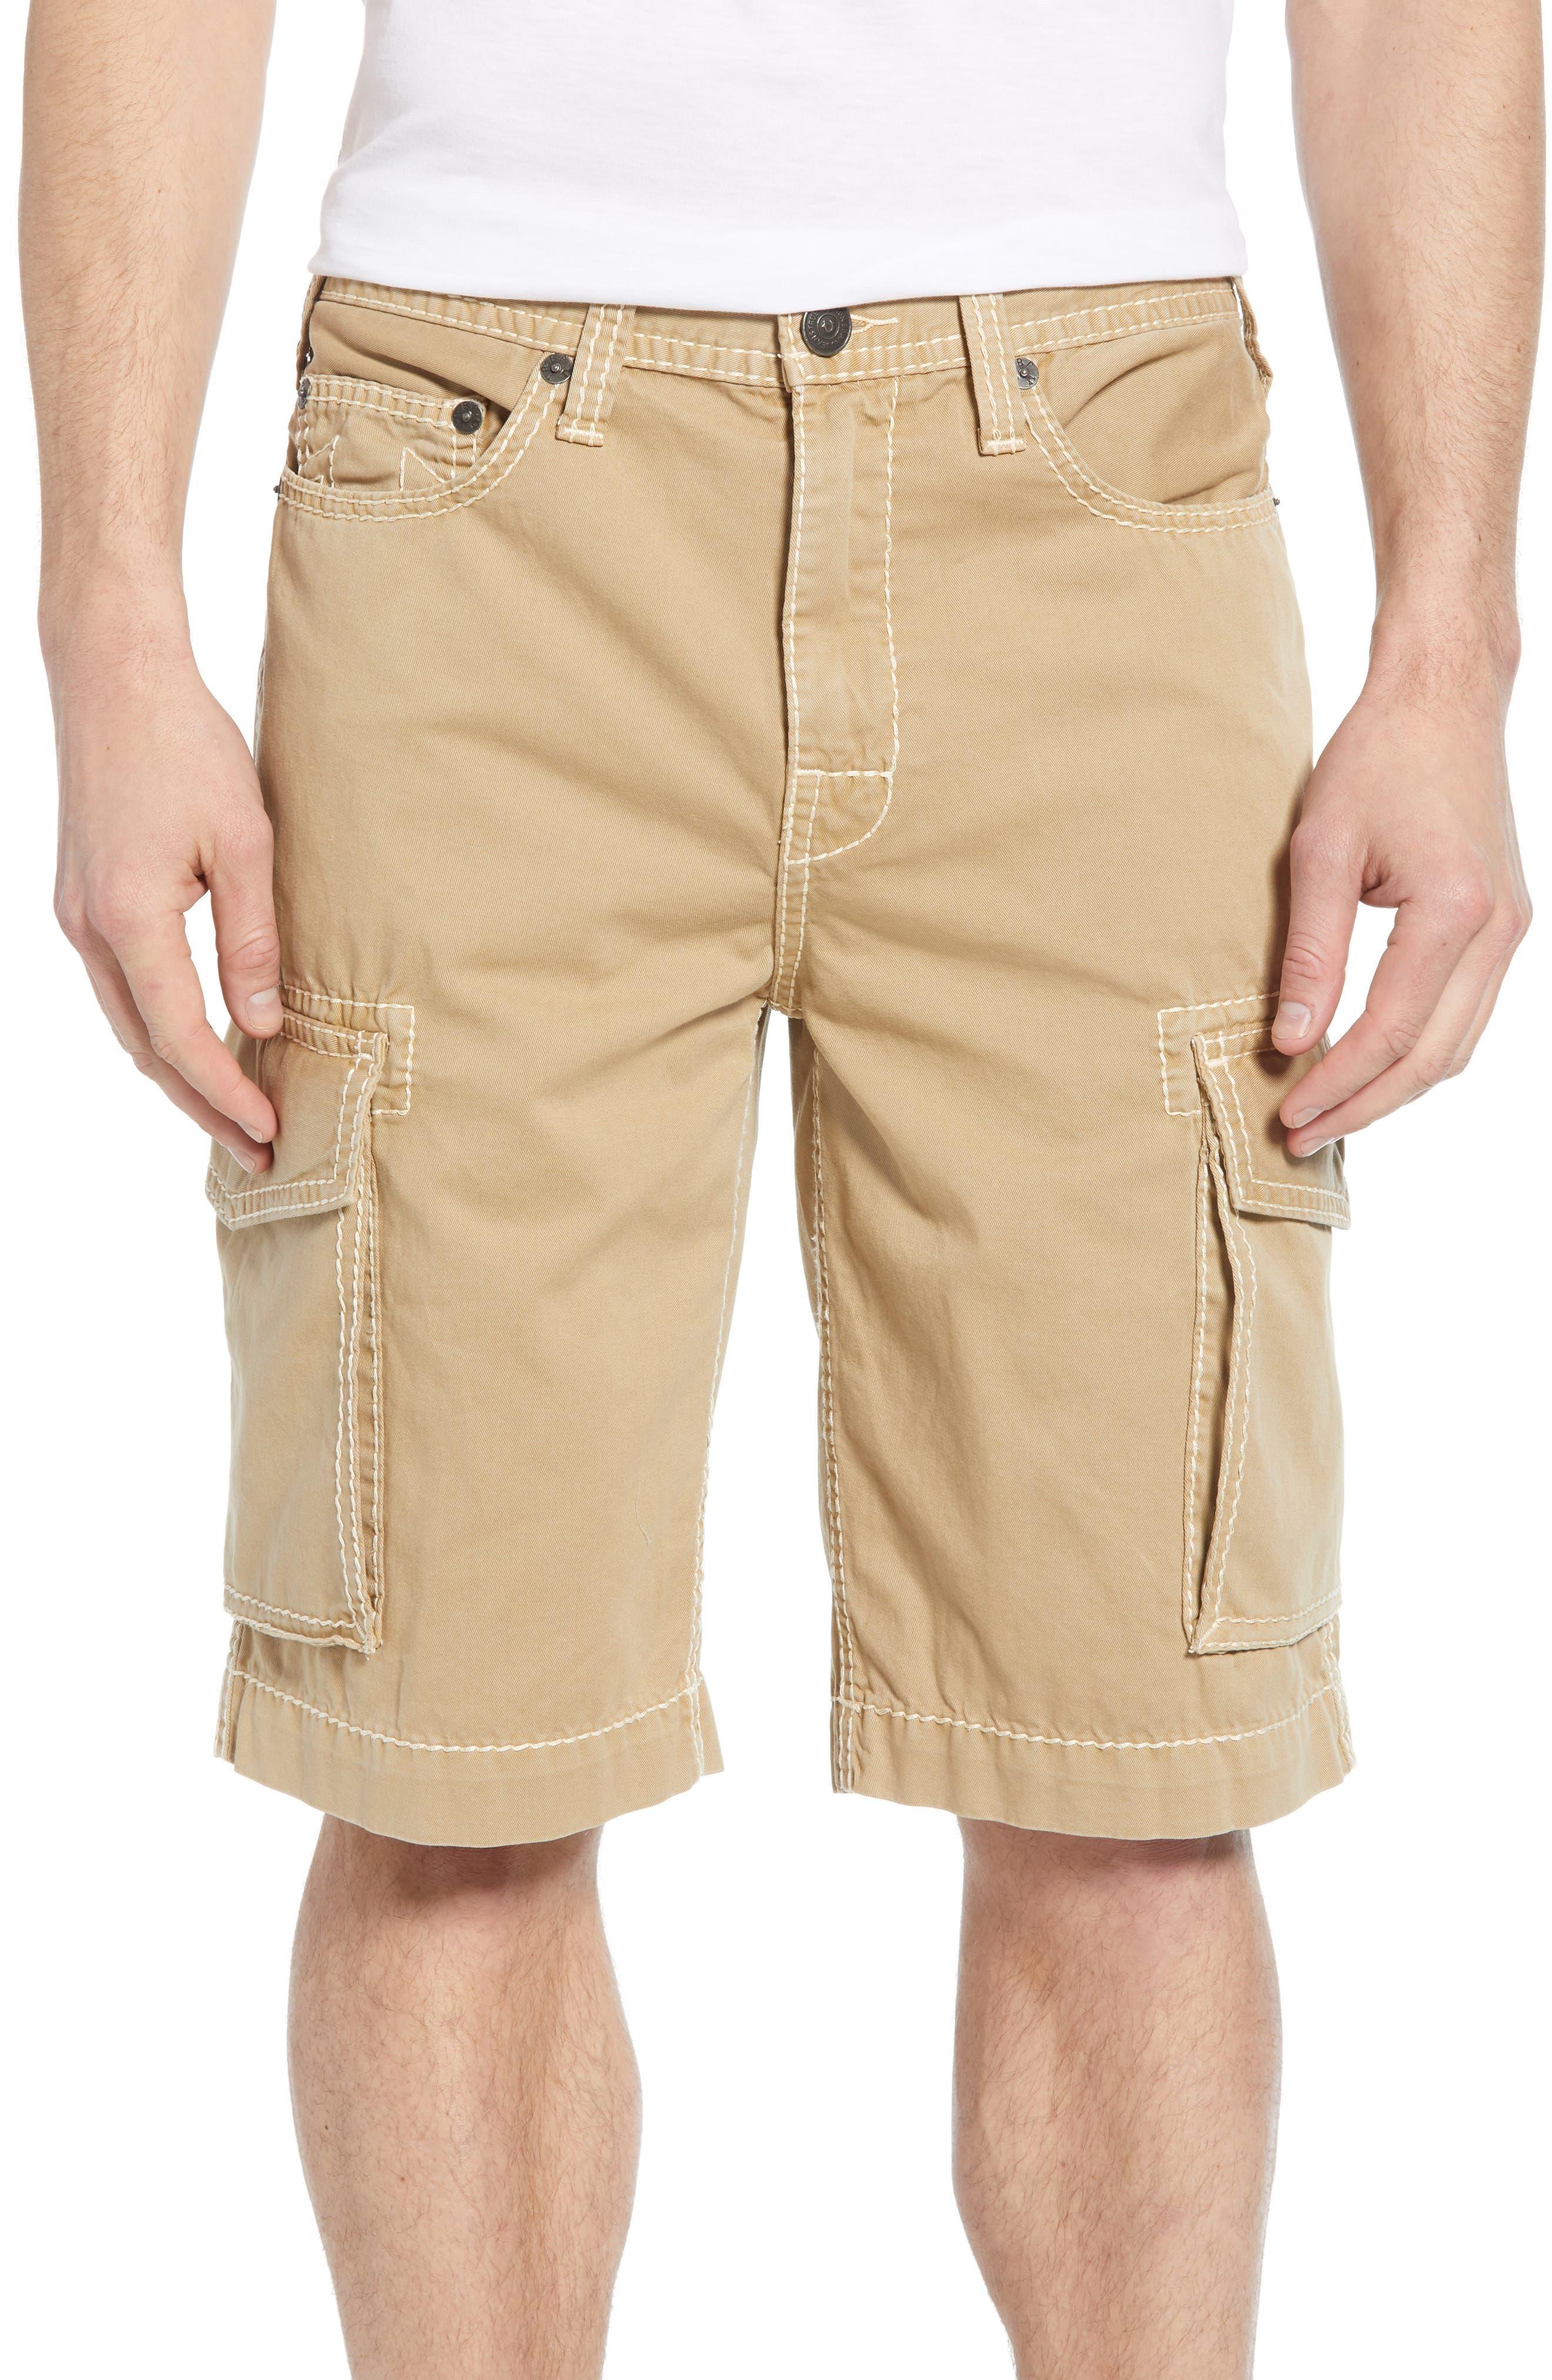 True Religion Brand Jeans Cargo Shorts, Brown